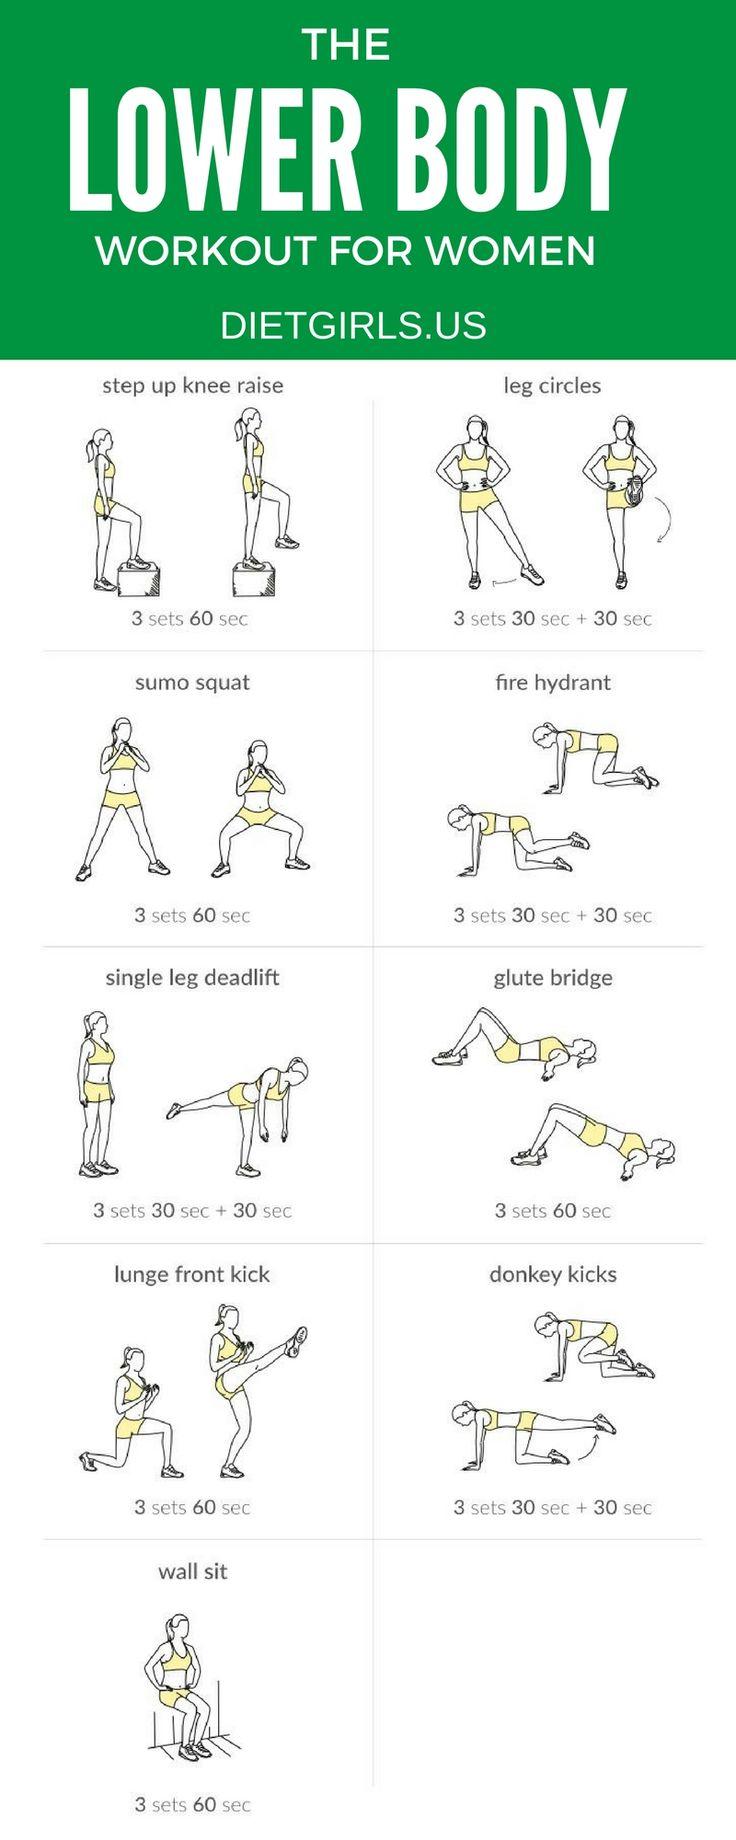 Lower Body Workout @ http://dietgirls.us